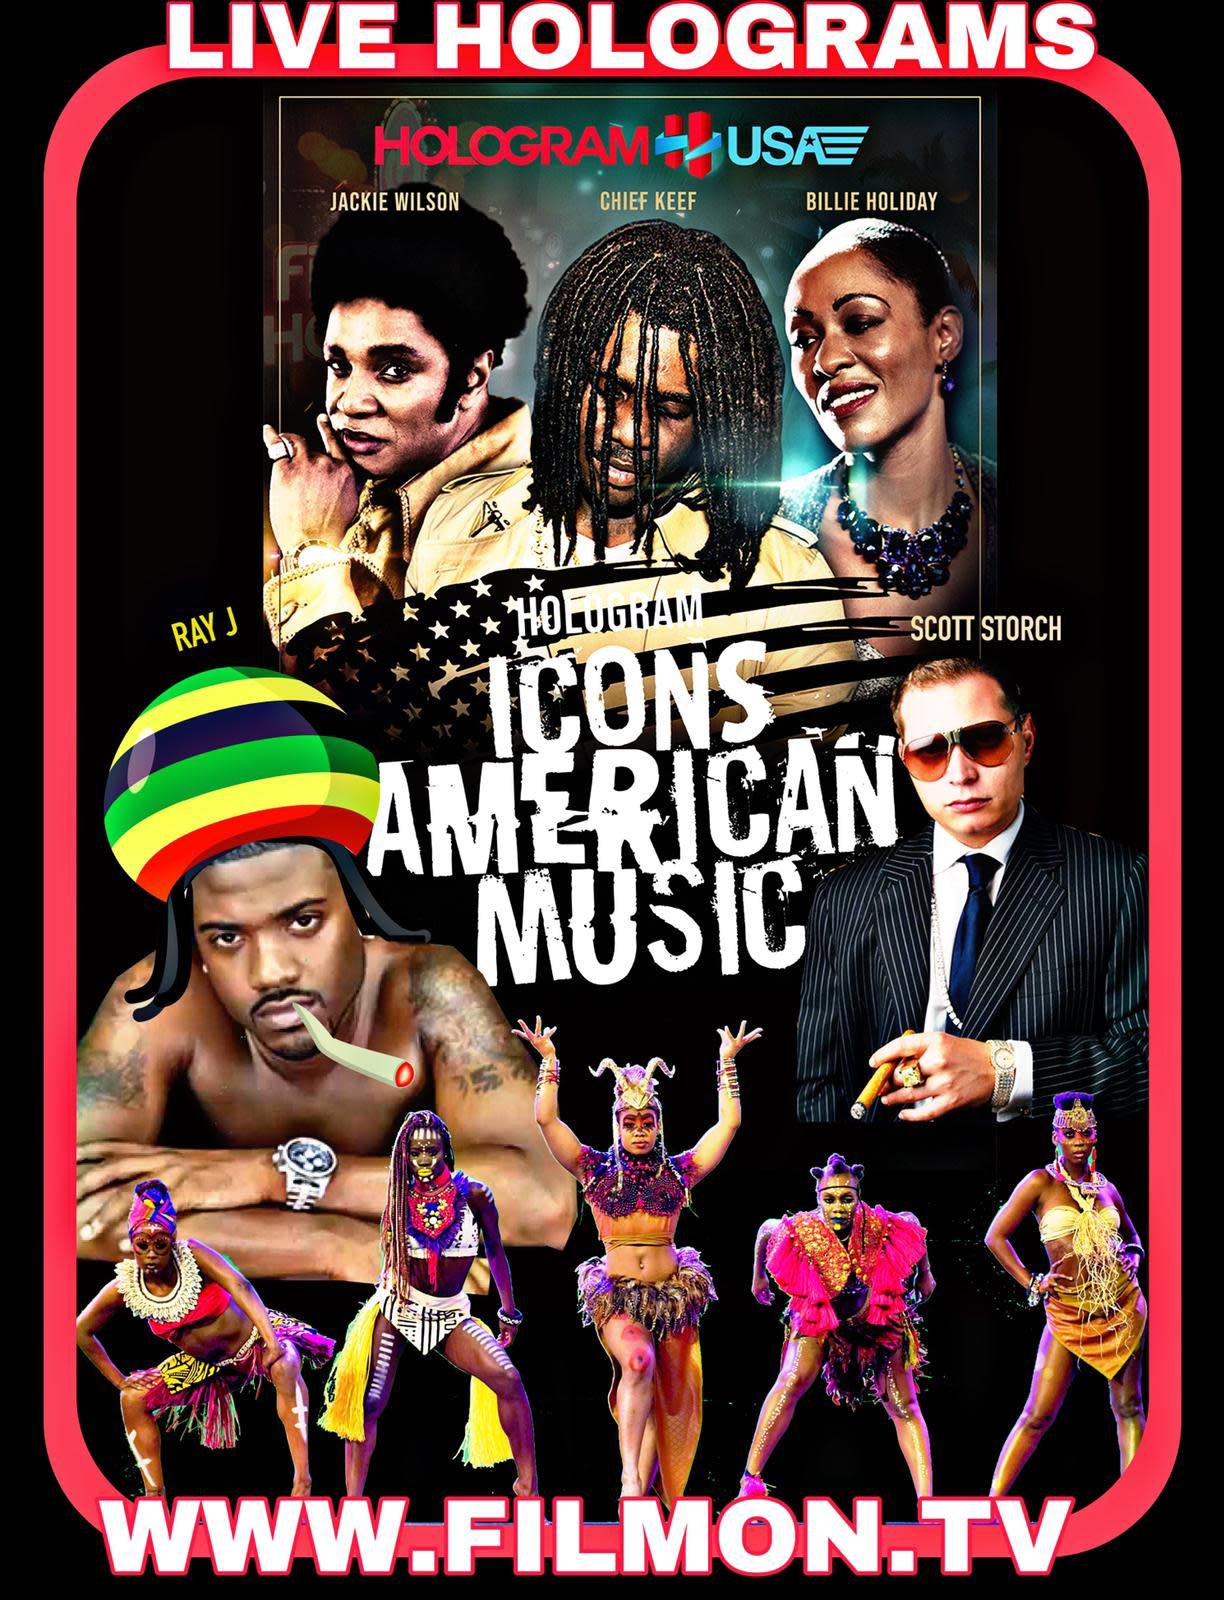 Holograms, Hip Hop and Ayahuasca: A Celebration of American Music and Hemp Health